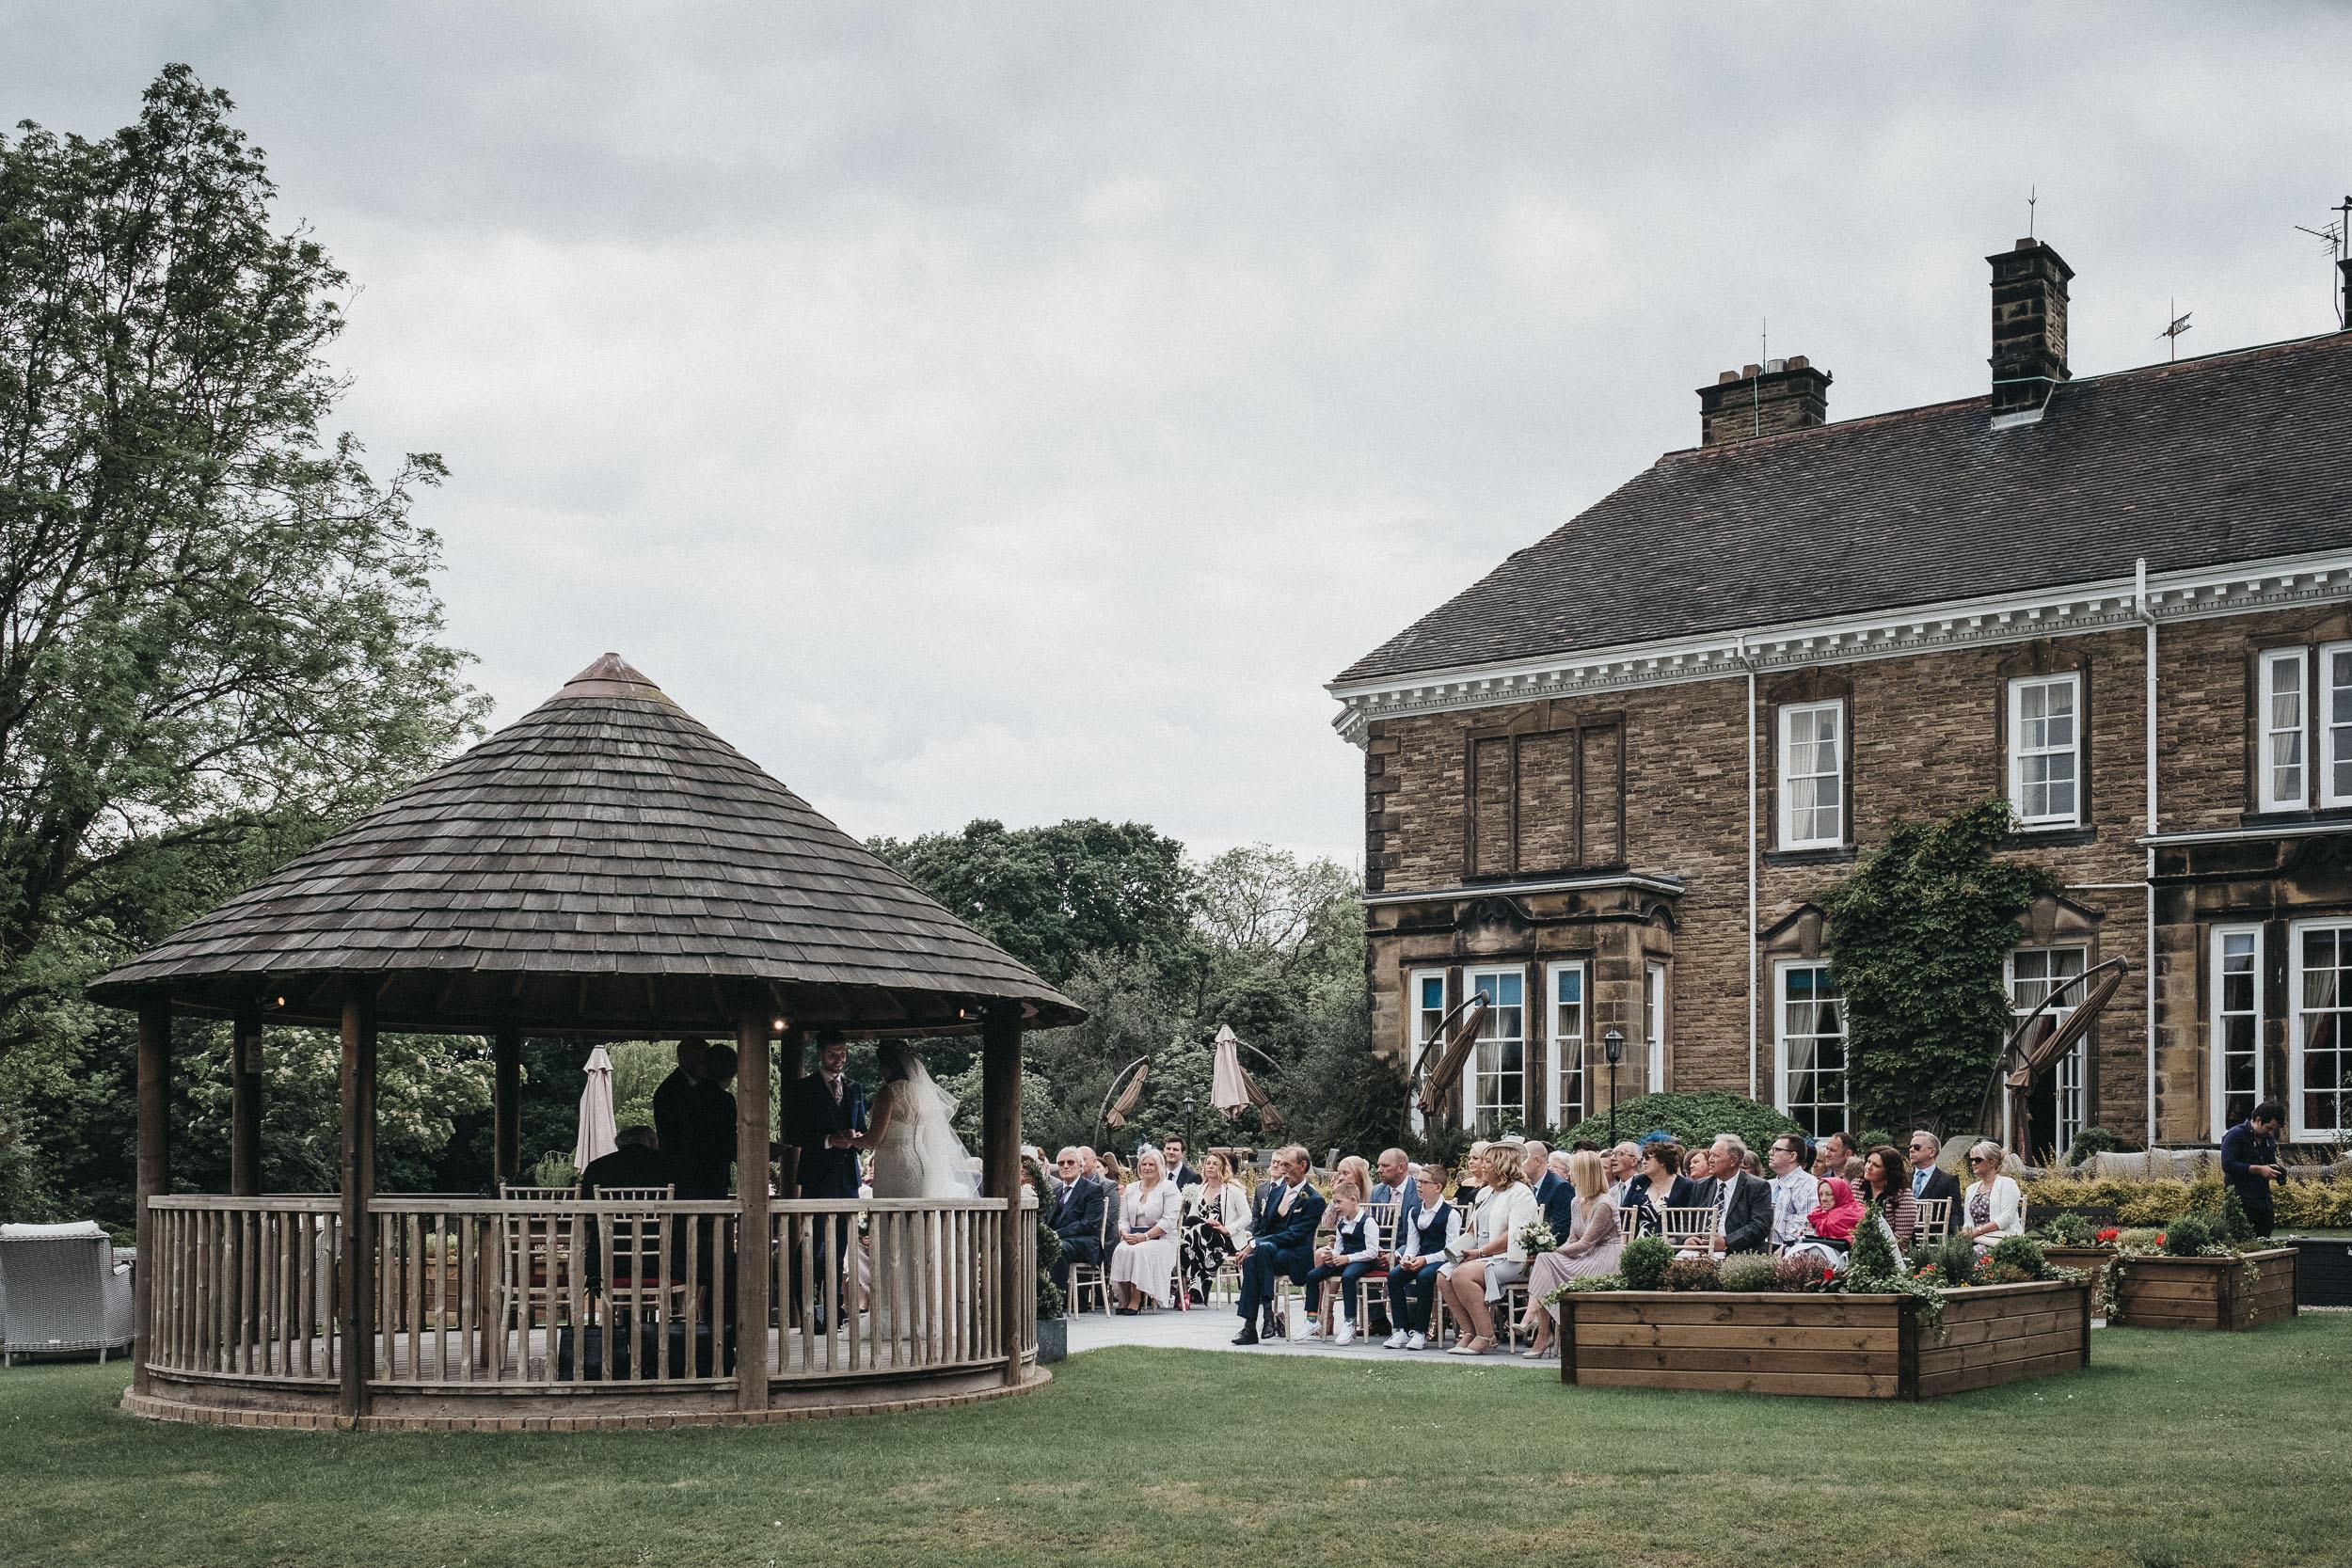 Wedding ceremony taking place in the gazebo at Judges at Kirklevington